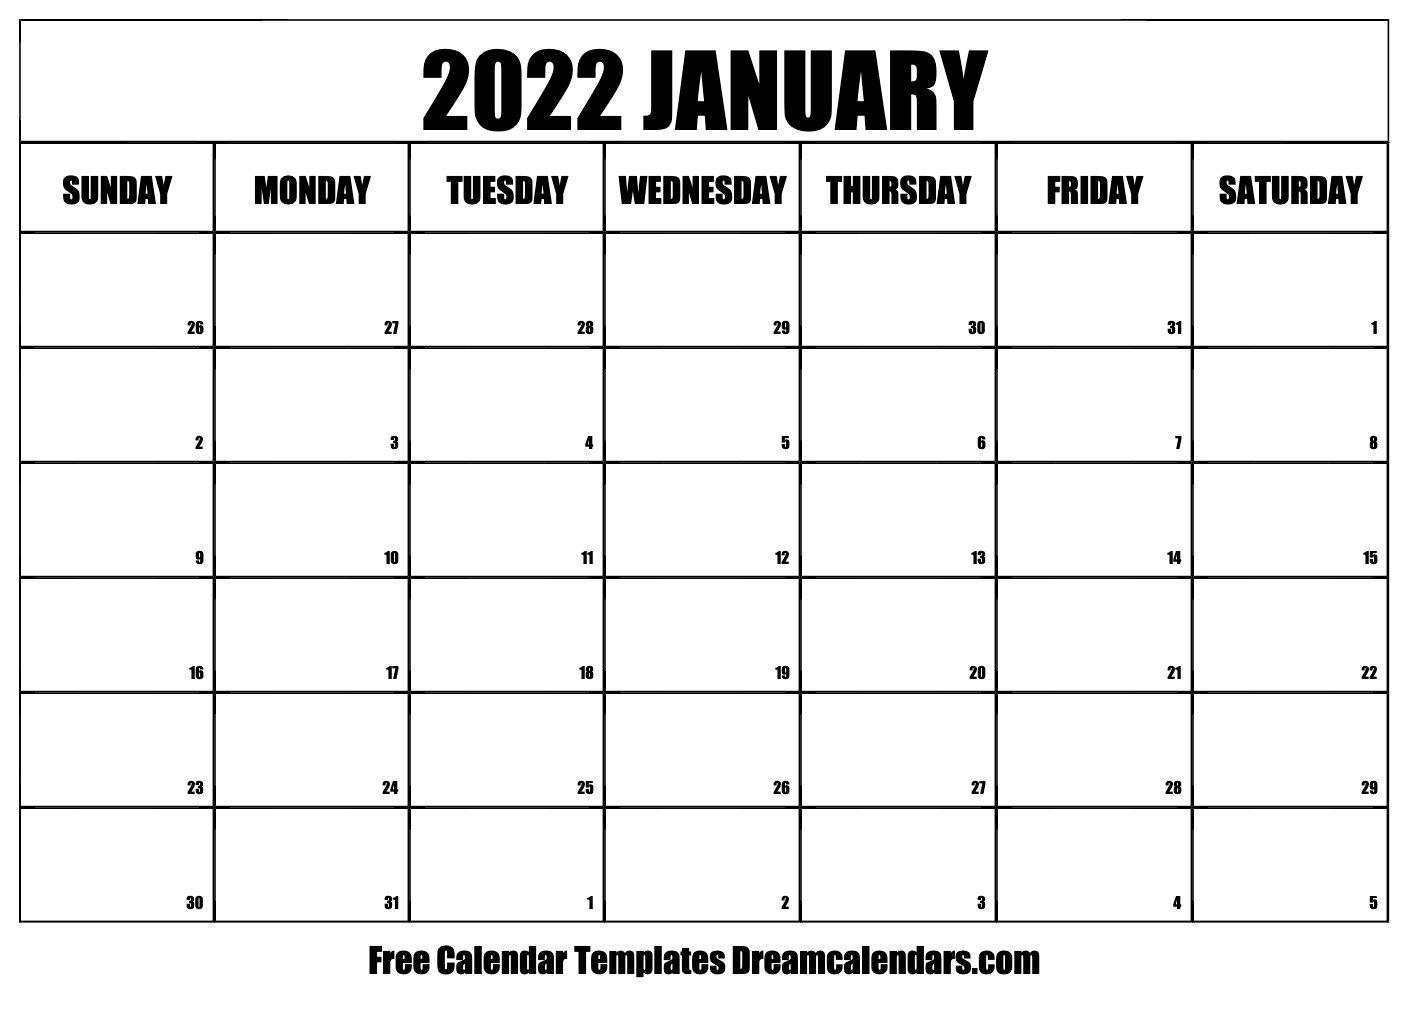 January 2022 Calendar | Free Blank Printable Templates inside Printable Calendar January 2022 Floral